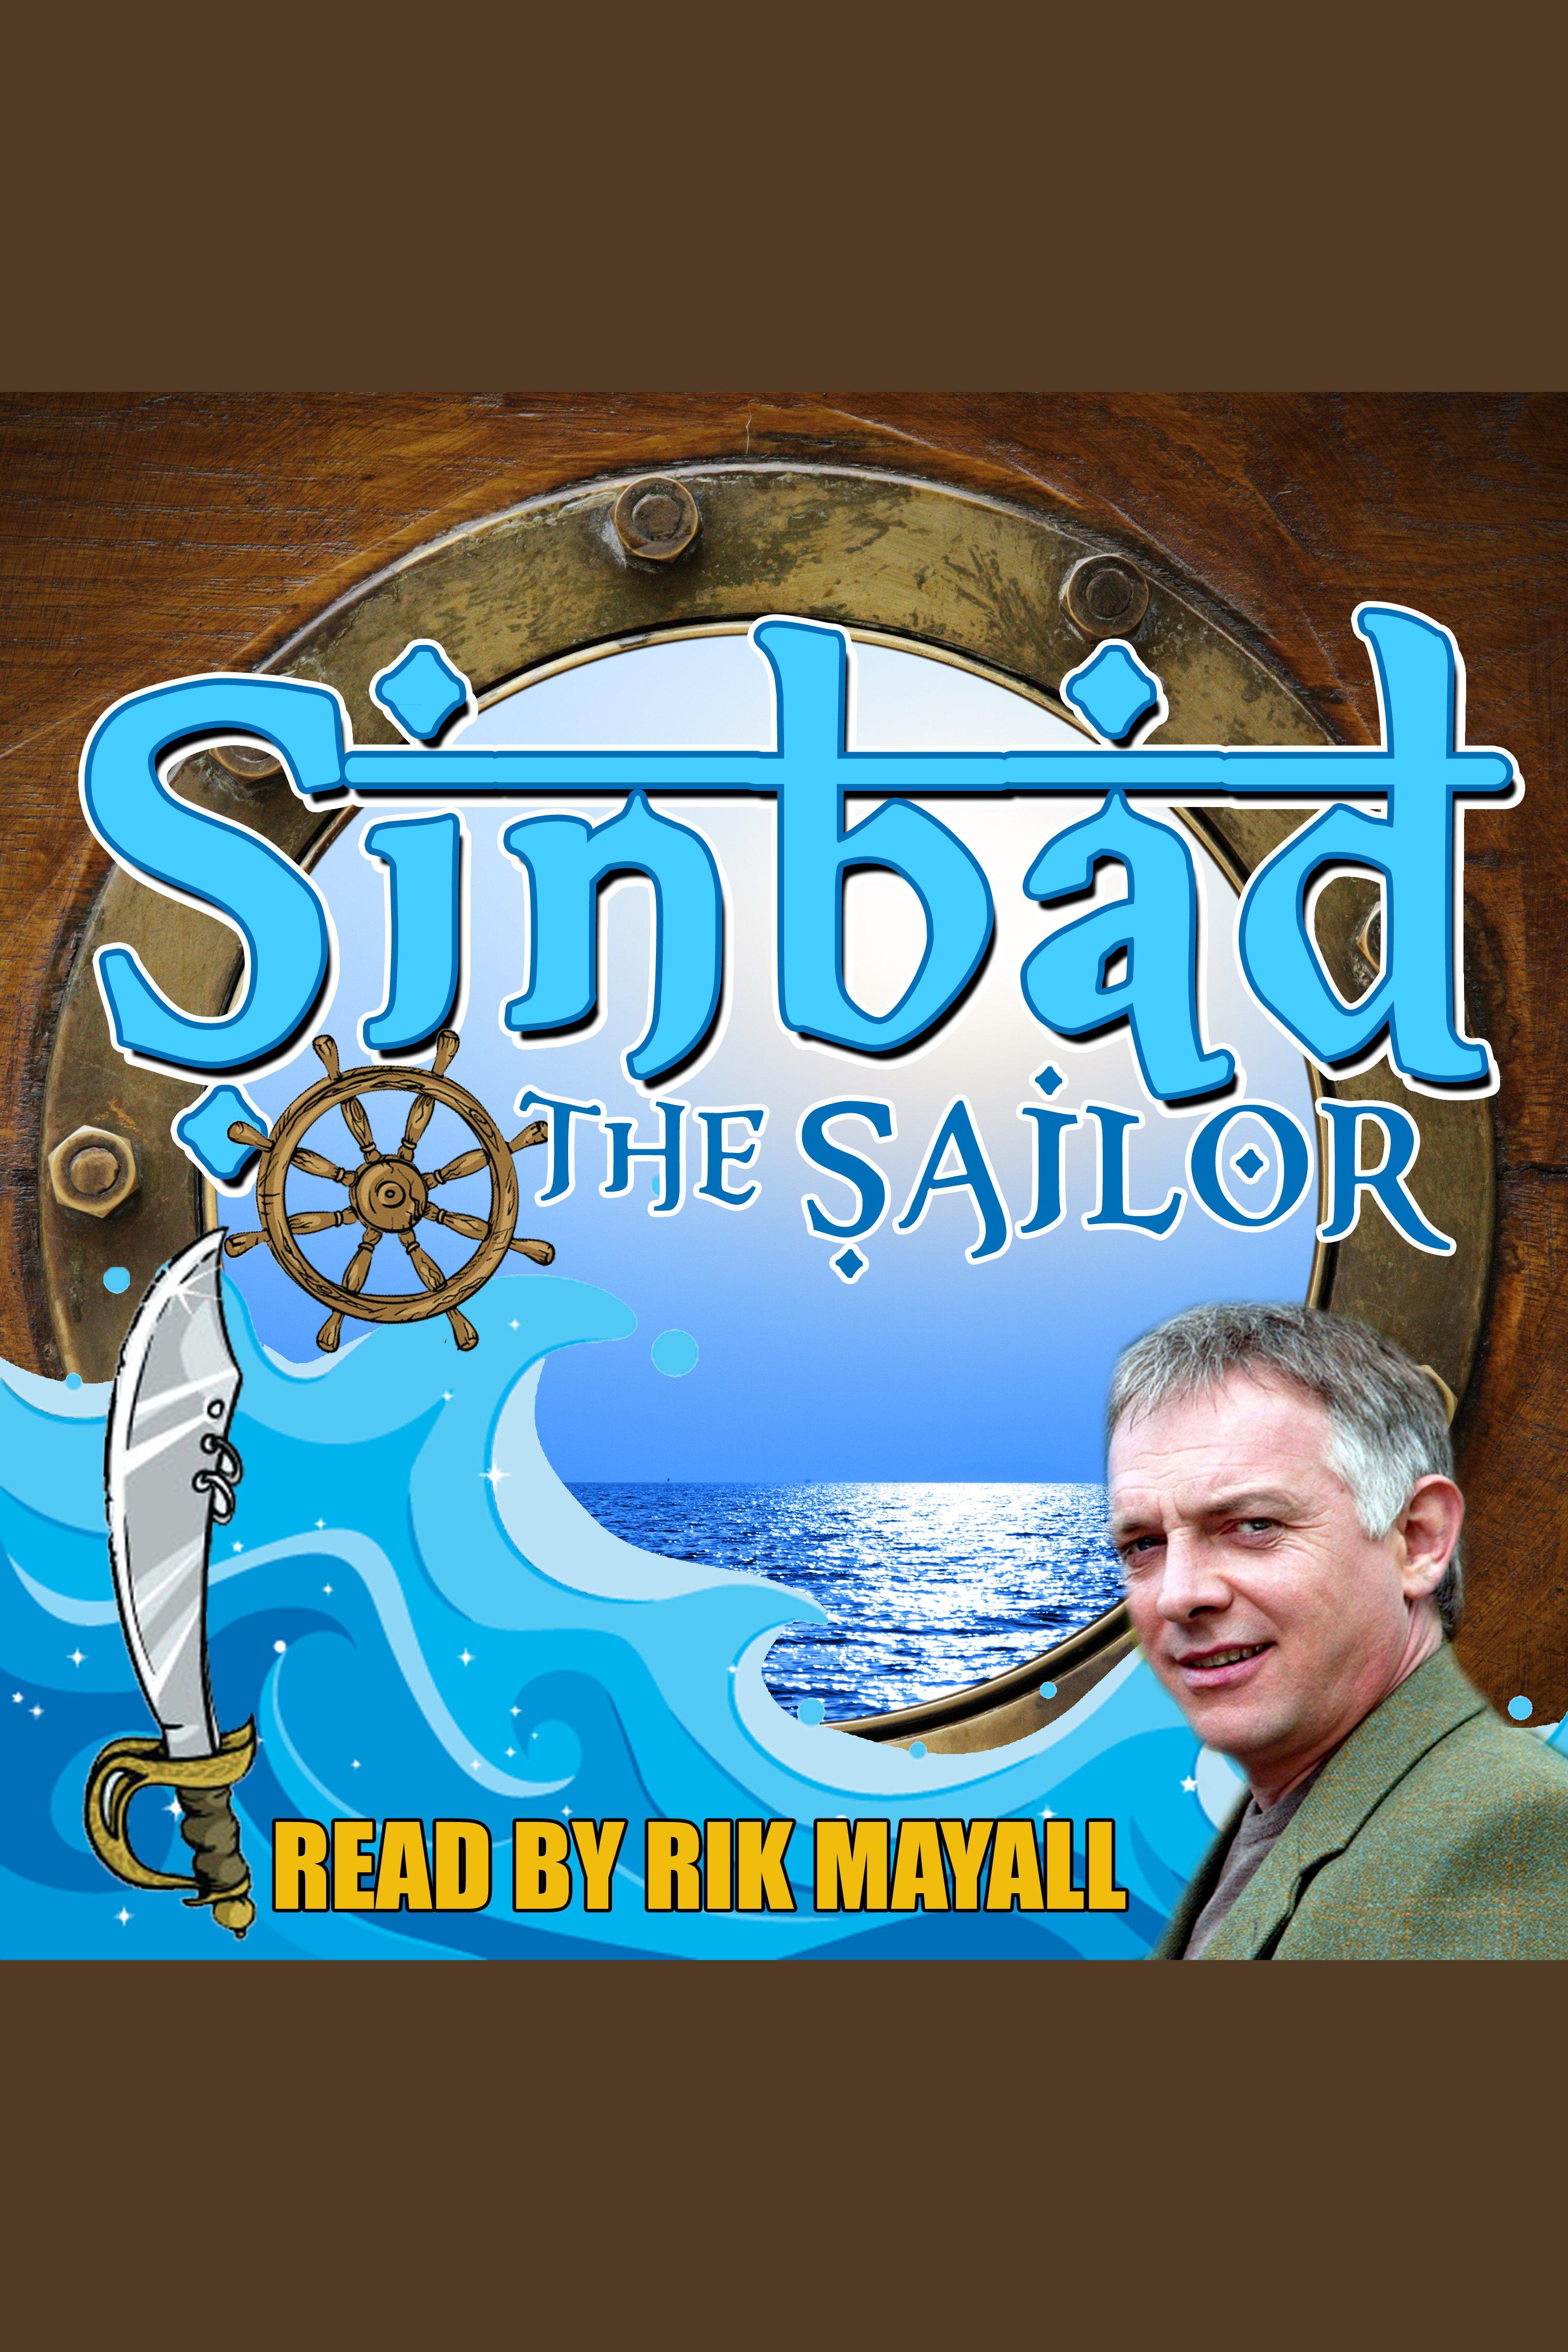 Sinbad the Sailor